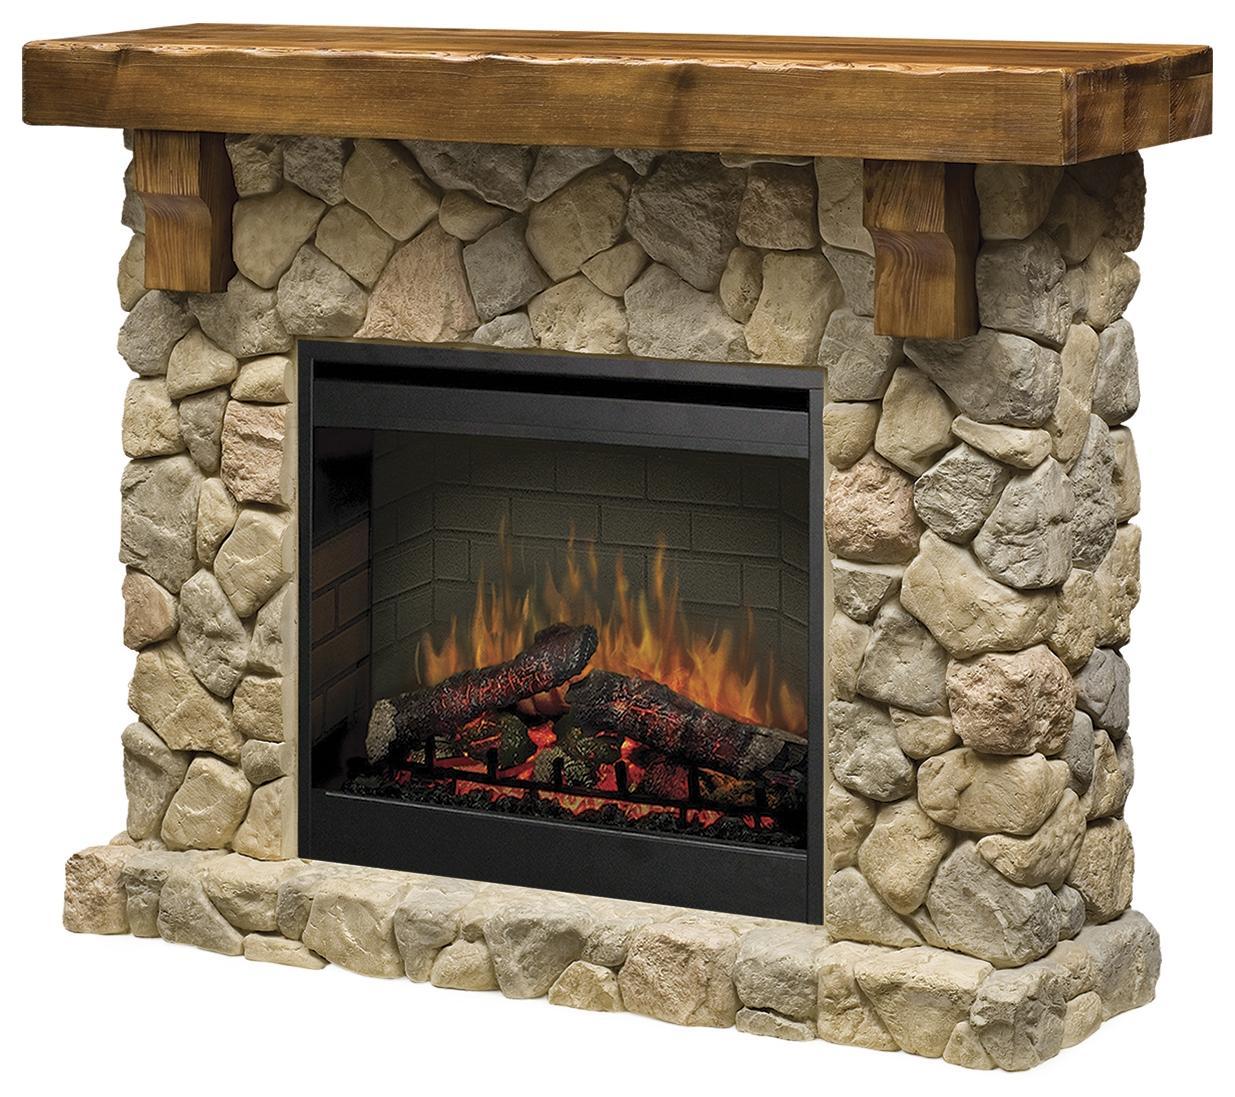 Flat-Wall Fireplaces Fieldstone Flat-Wall Fireplace by Dimplex at Jordan's Home Furnishings